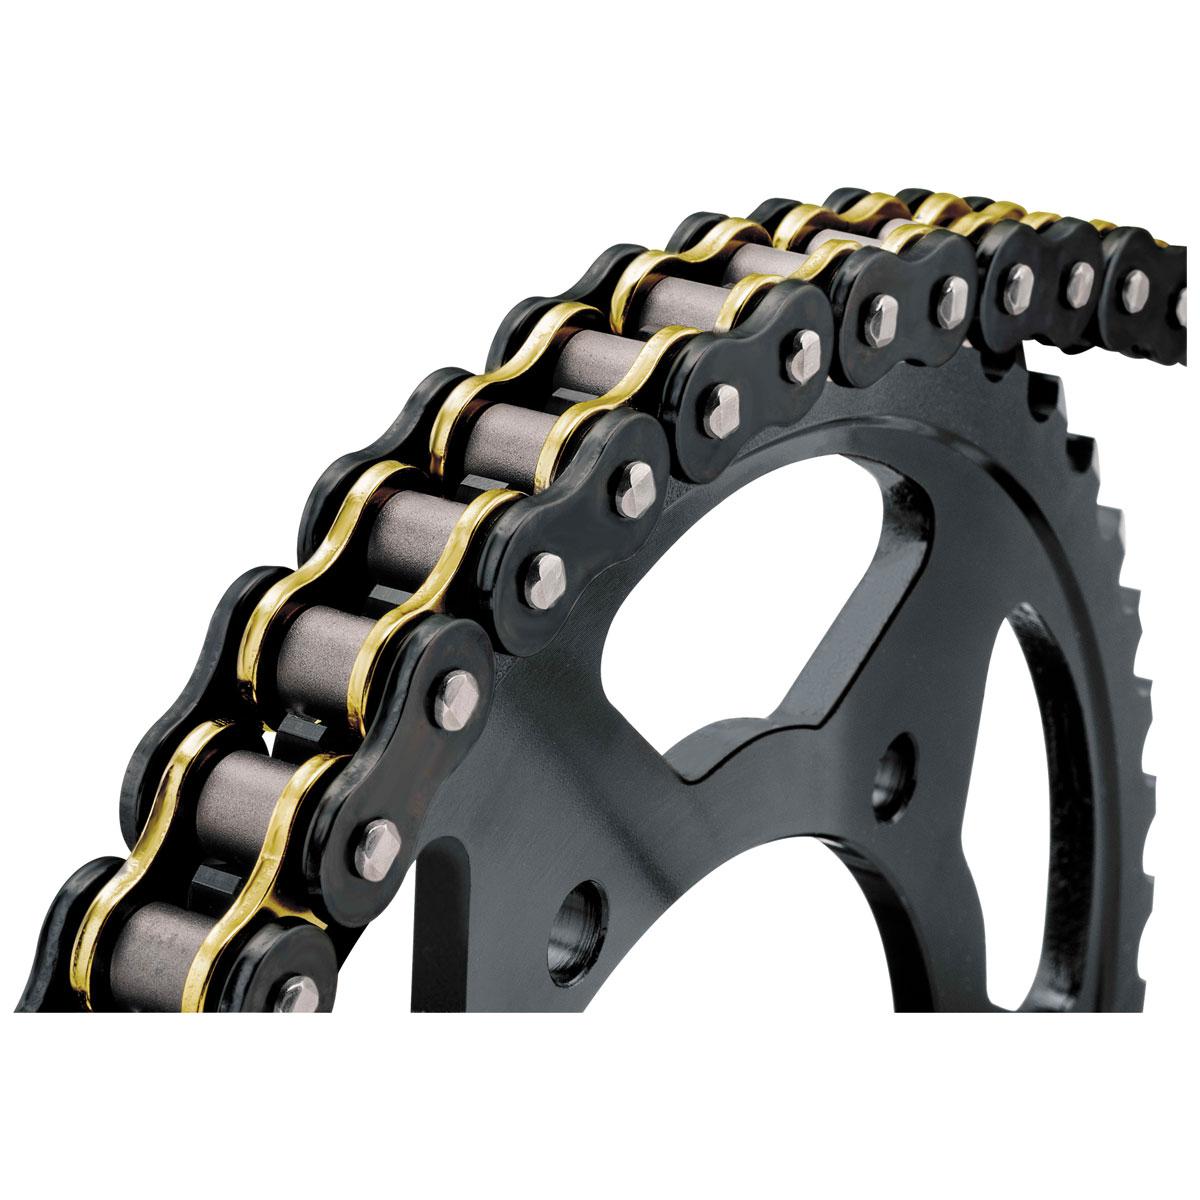 BikeMaster 520 BMOR X 120 O-ring Chain Black/Gold